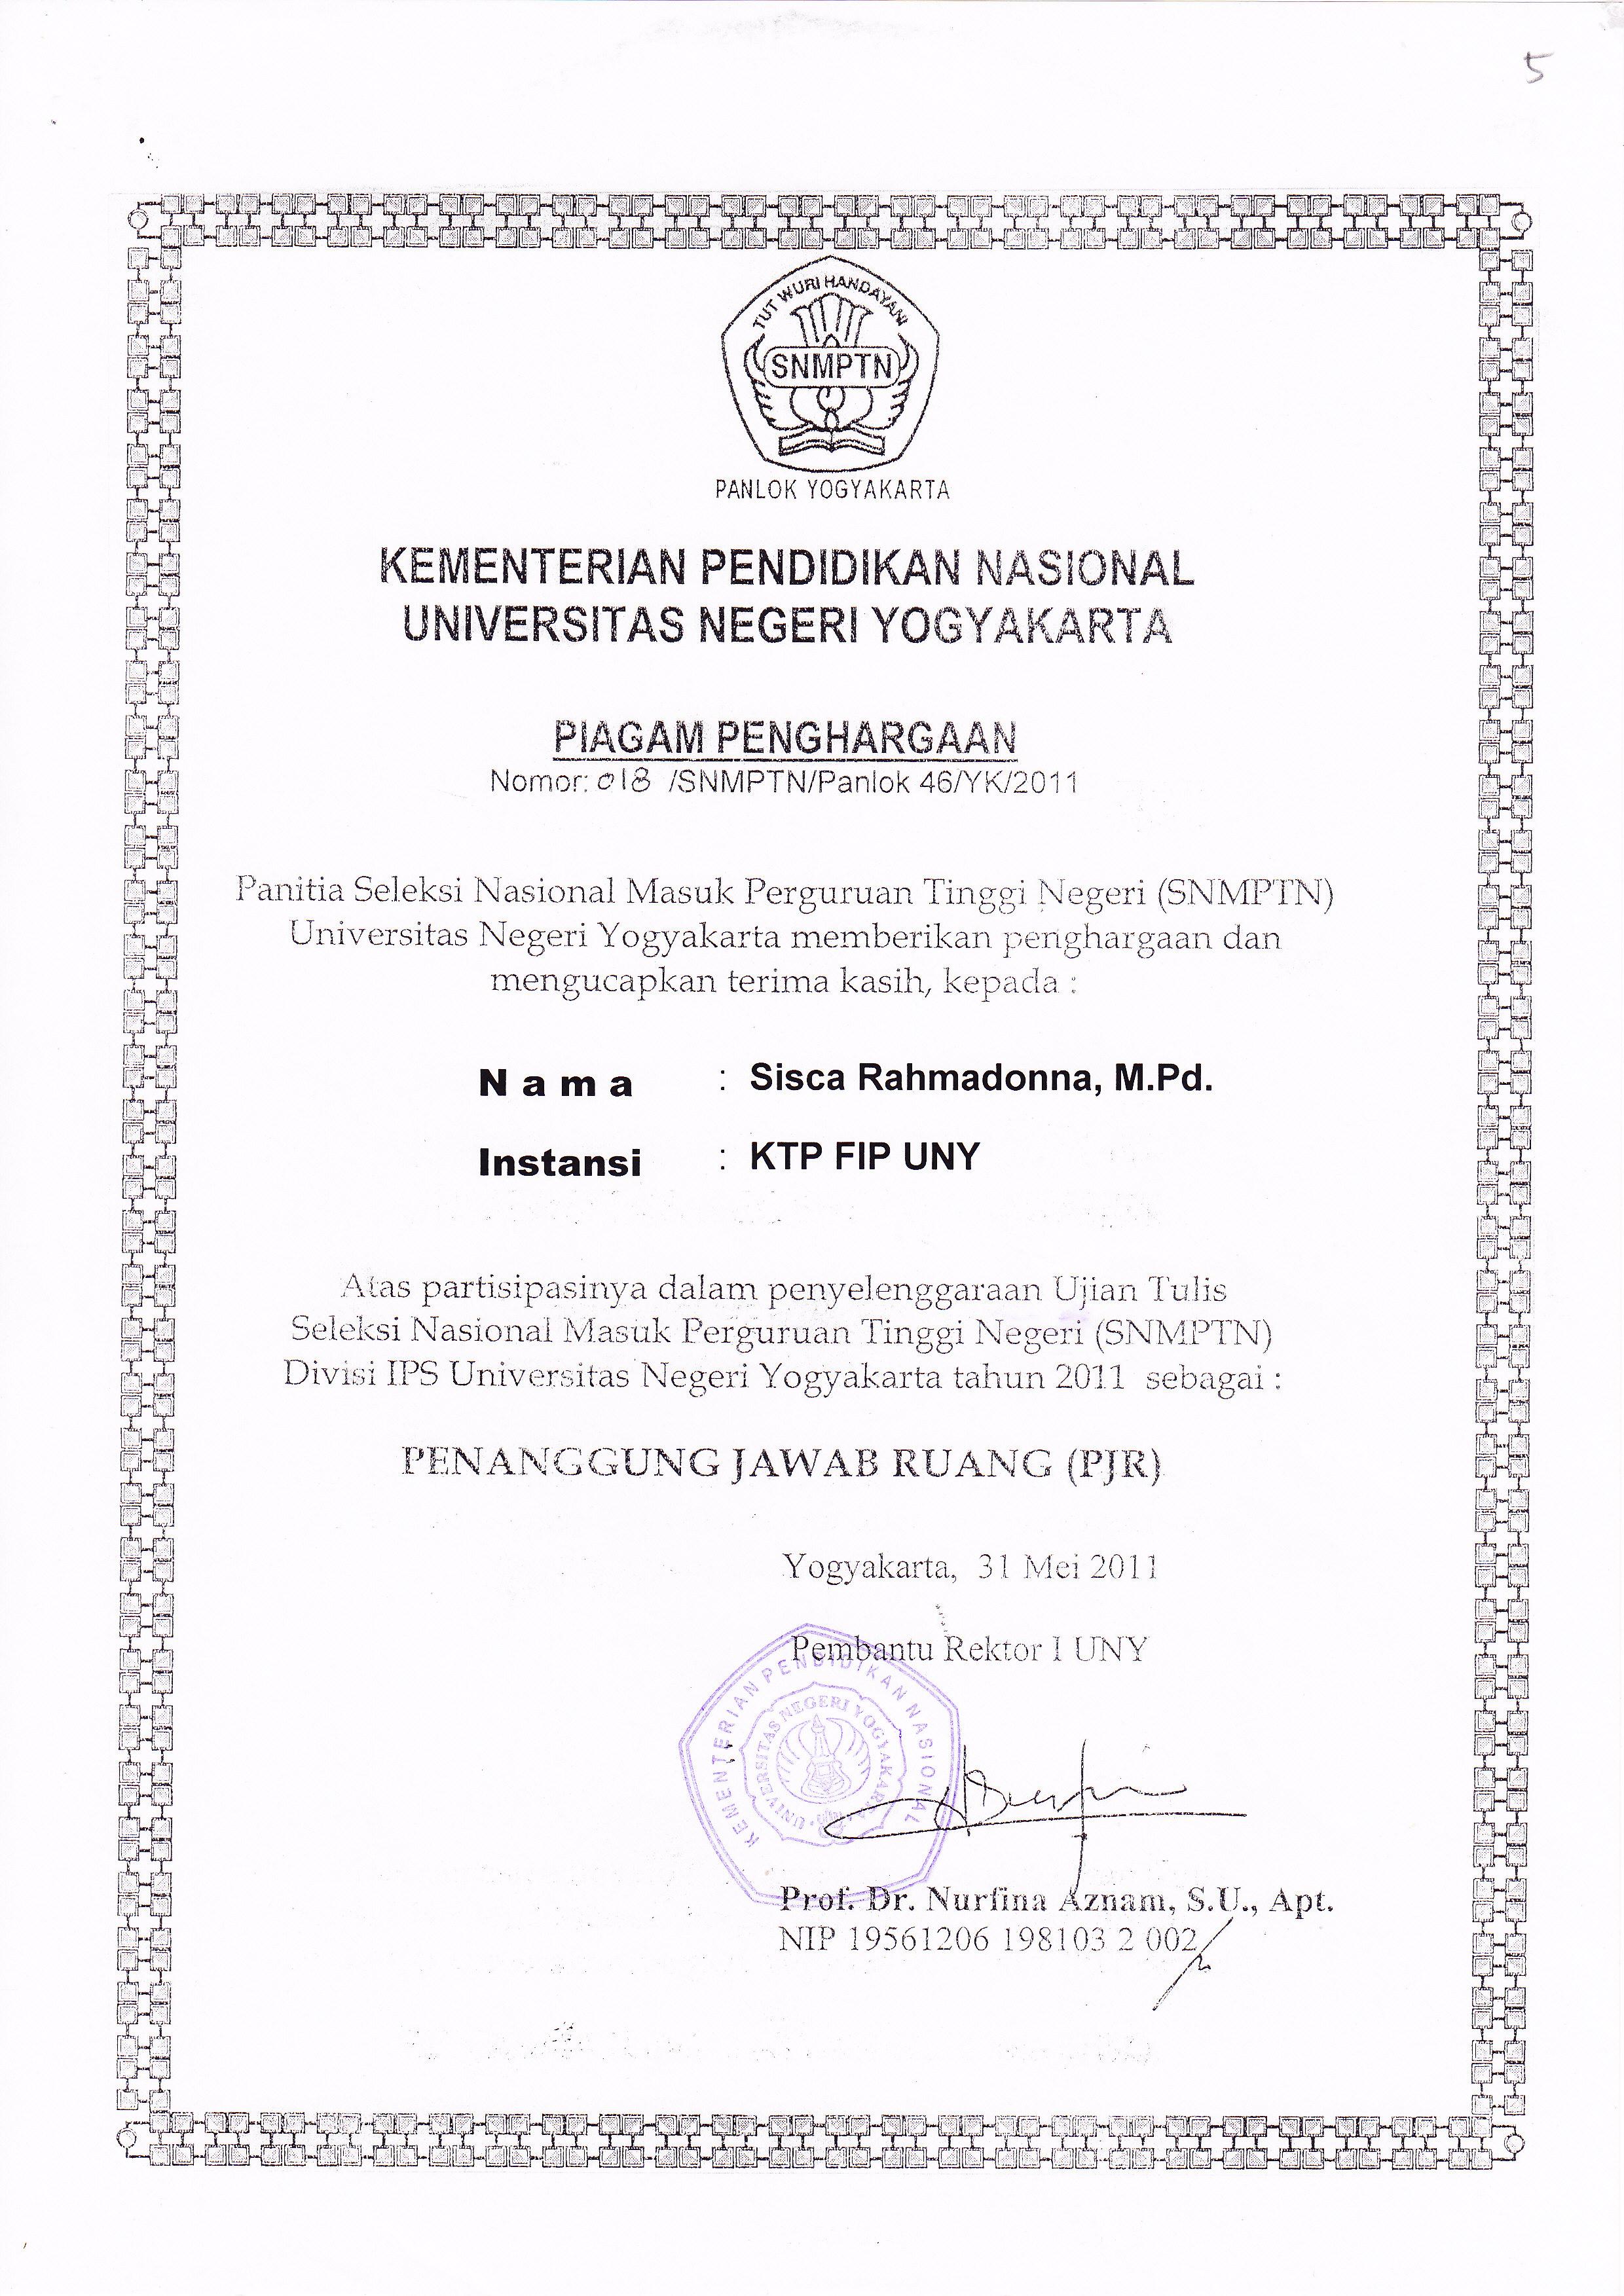 Sertifikat PJR 2012.jpg